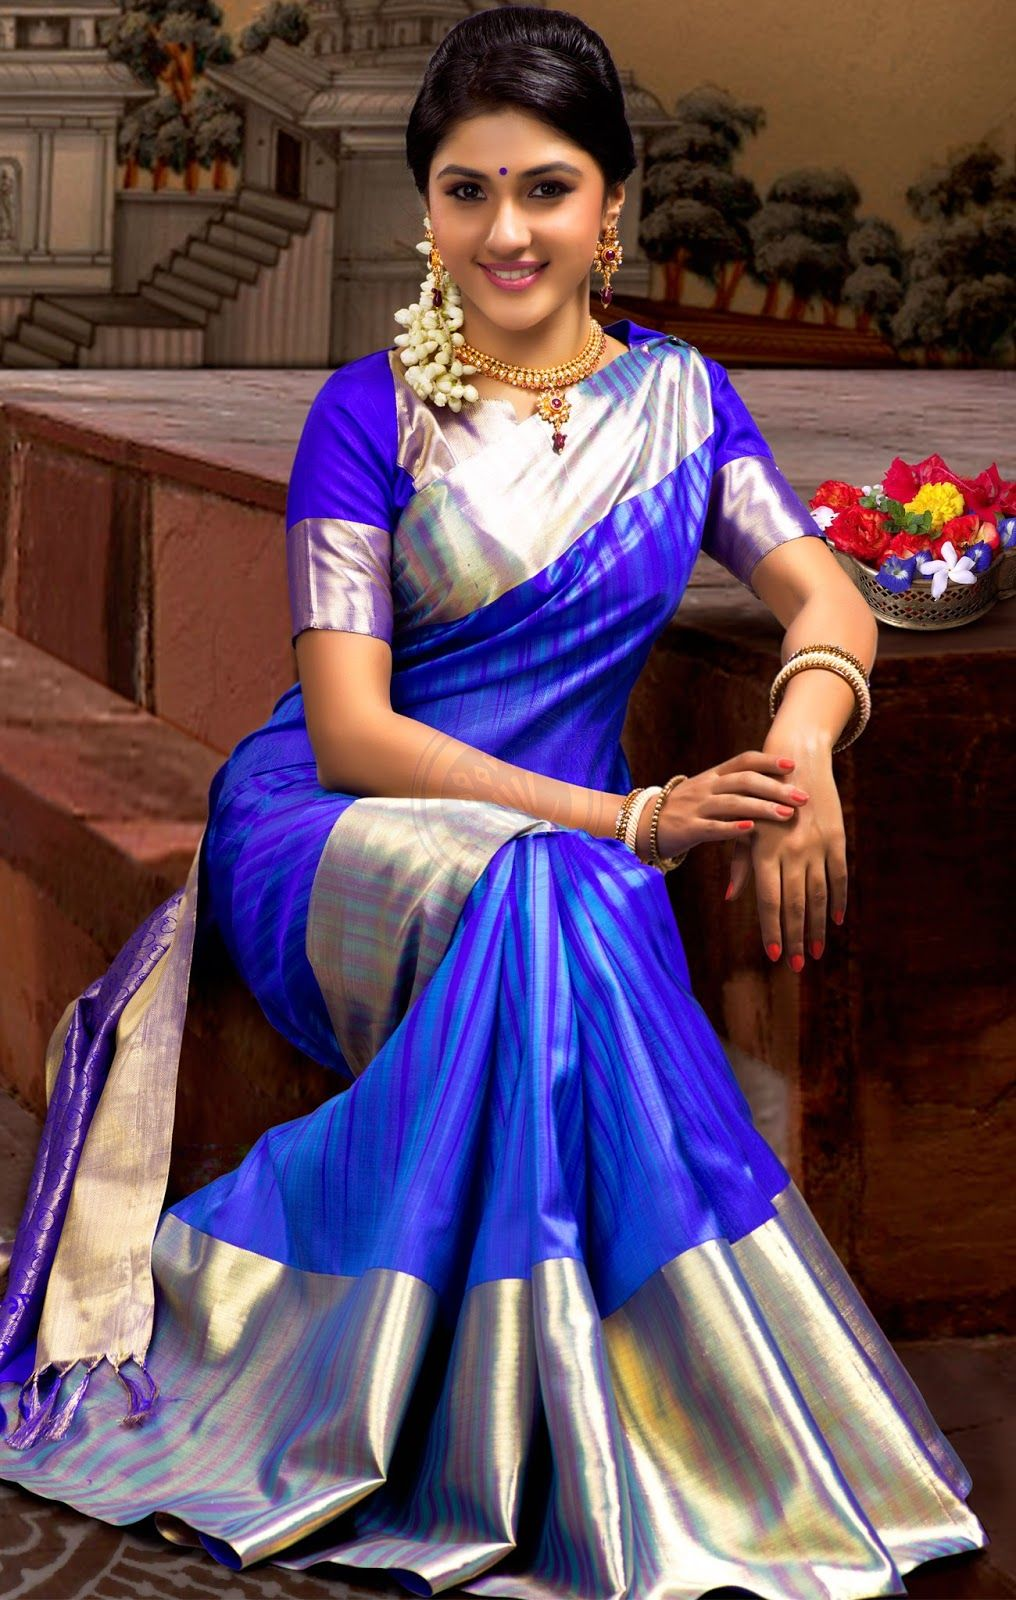 South indian bride temple jewelry jhumkis silk kanchipuram silk sarees online shopping wedding sarees kanchipuram silk sarees buy silk sarees in tamilnadu india izmirmasajfo Gallery